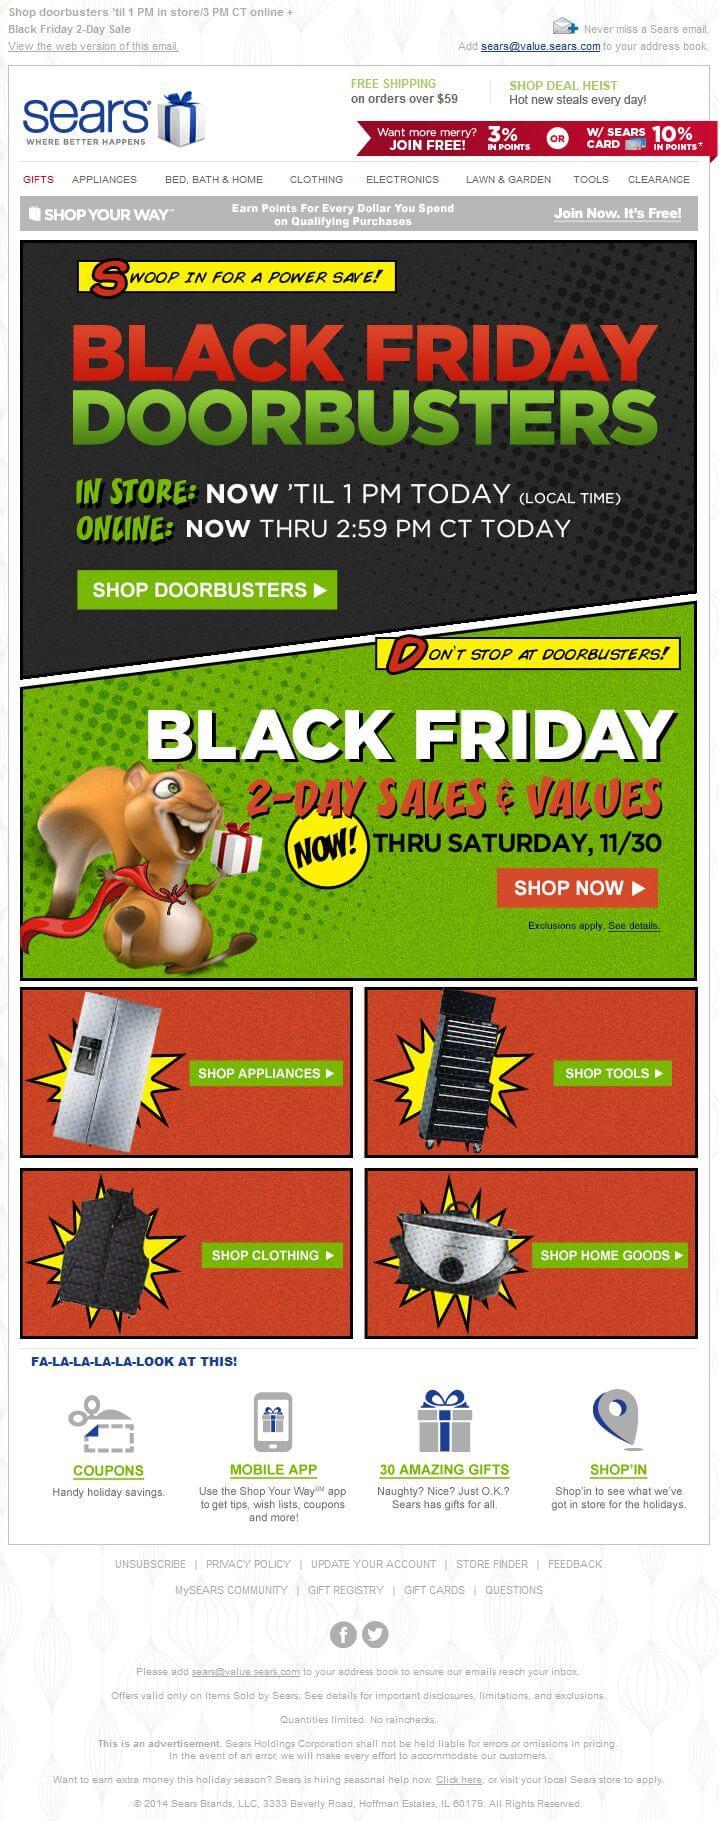 Sears Black Friday